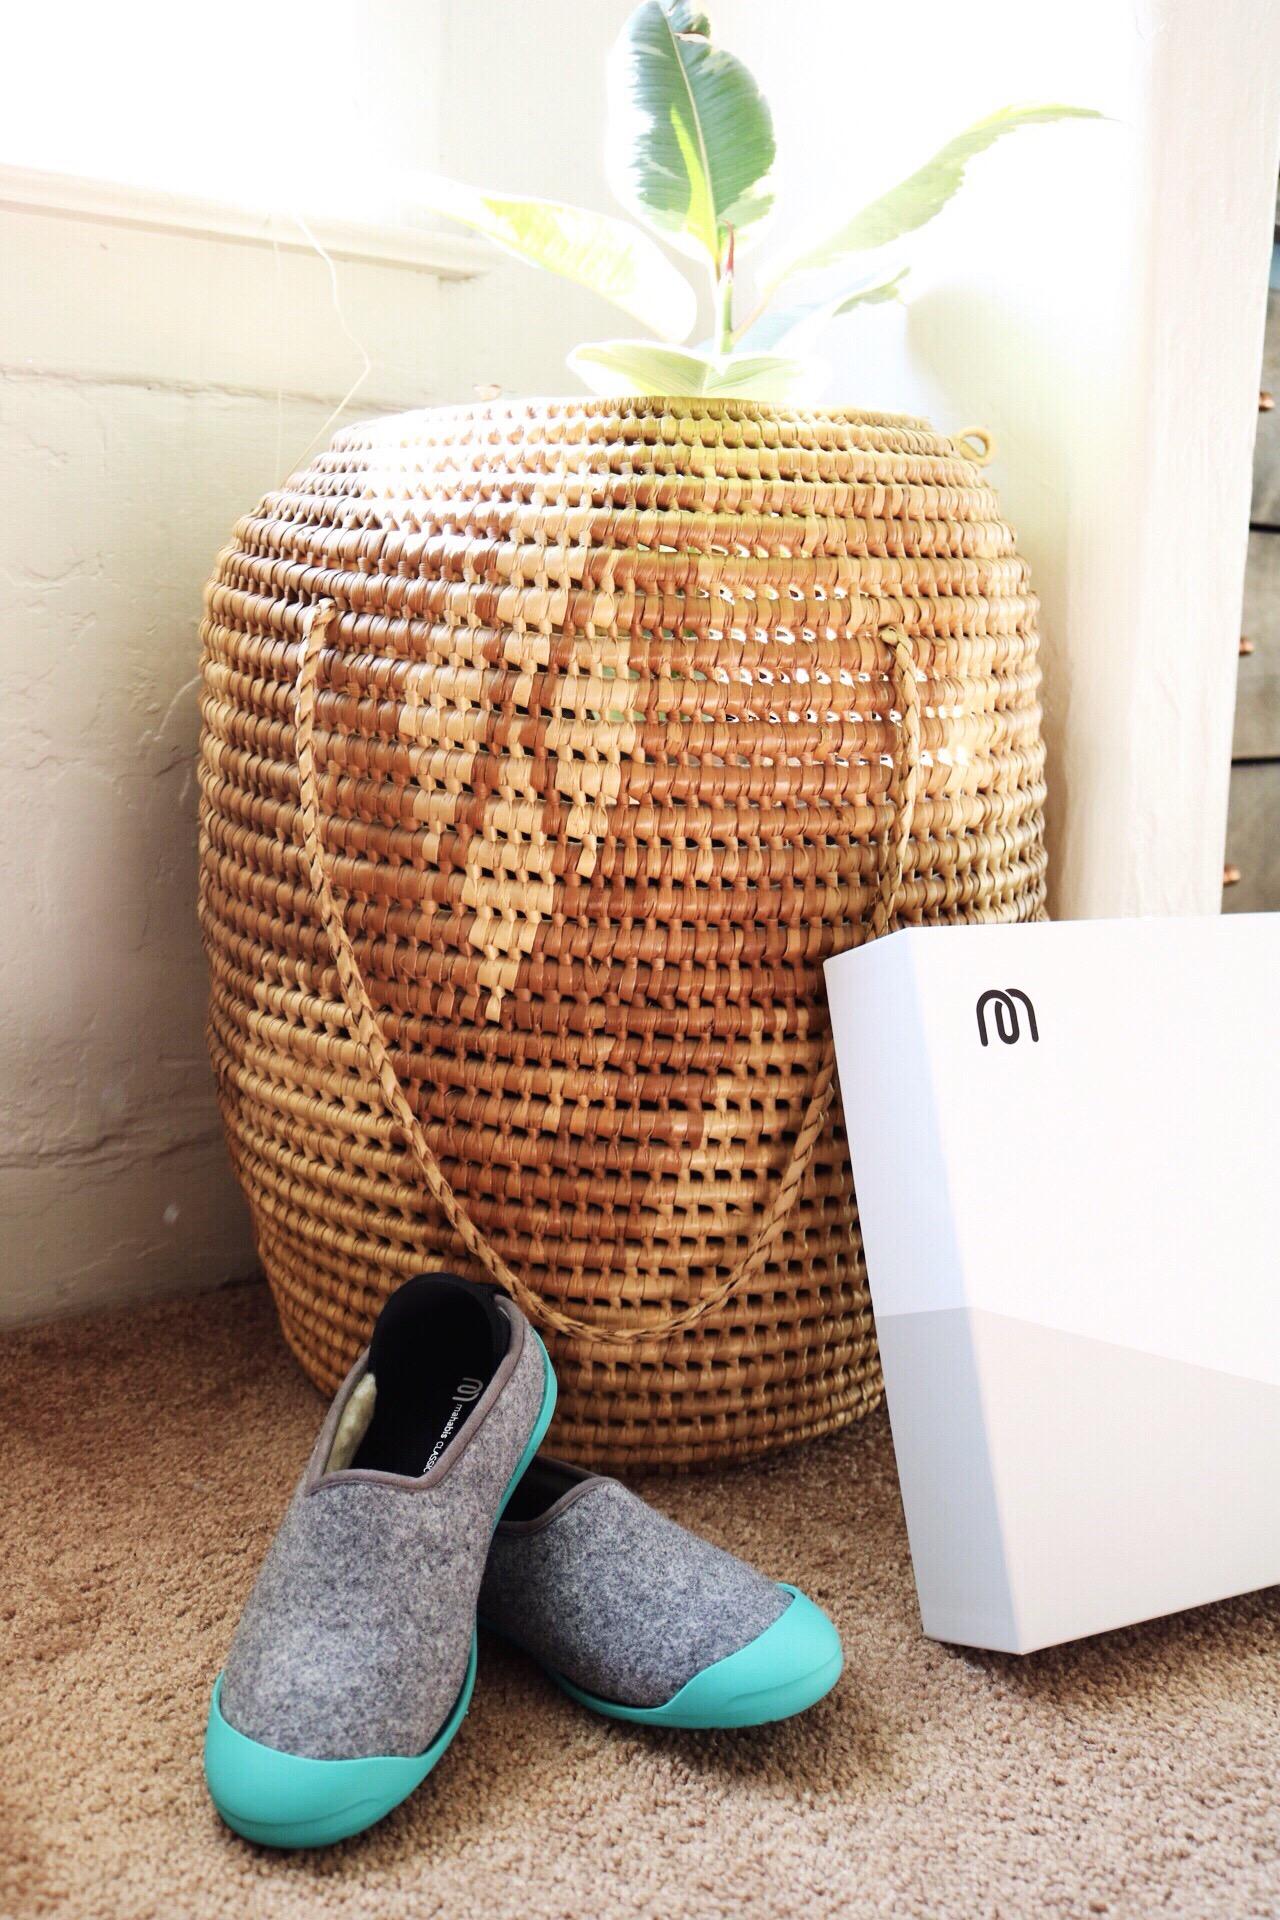 Mahabis slippers, straw basket